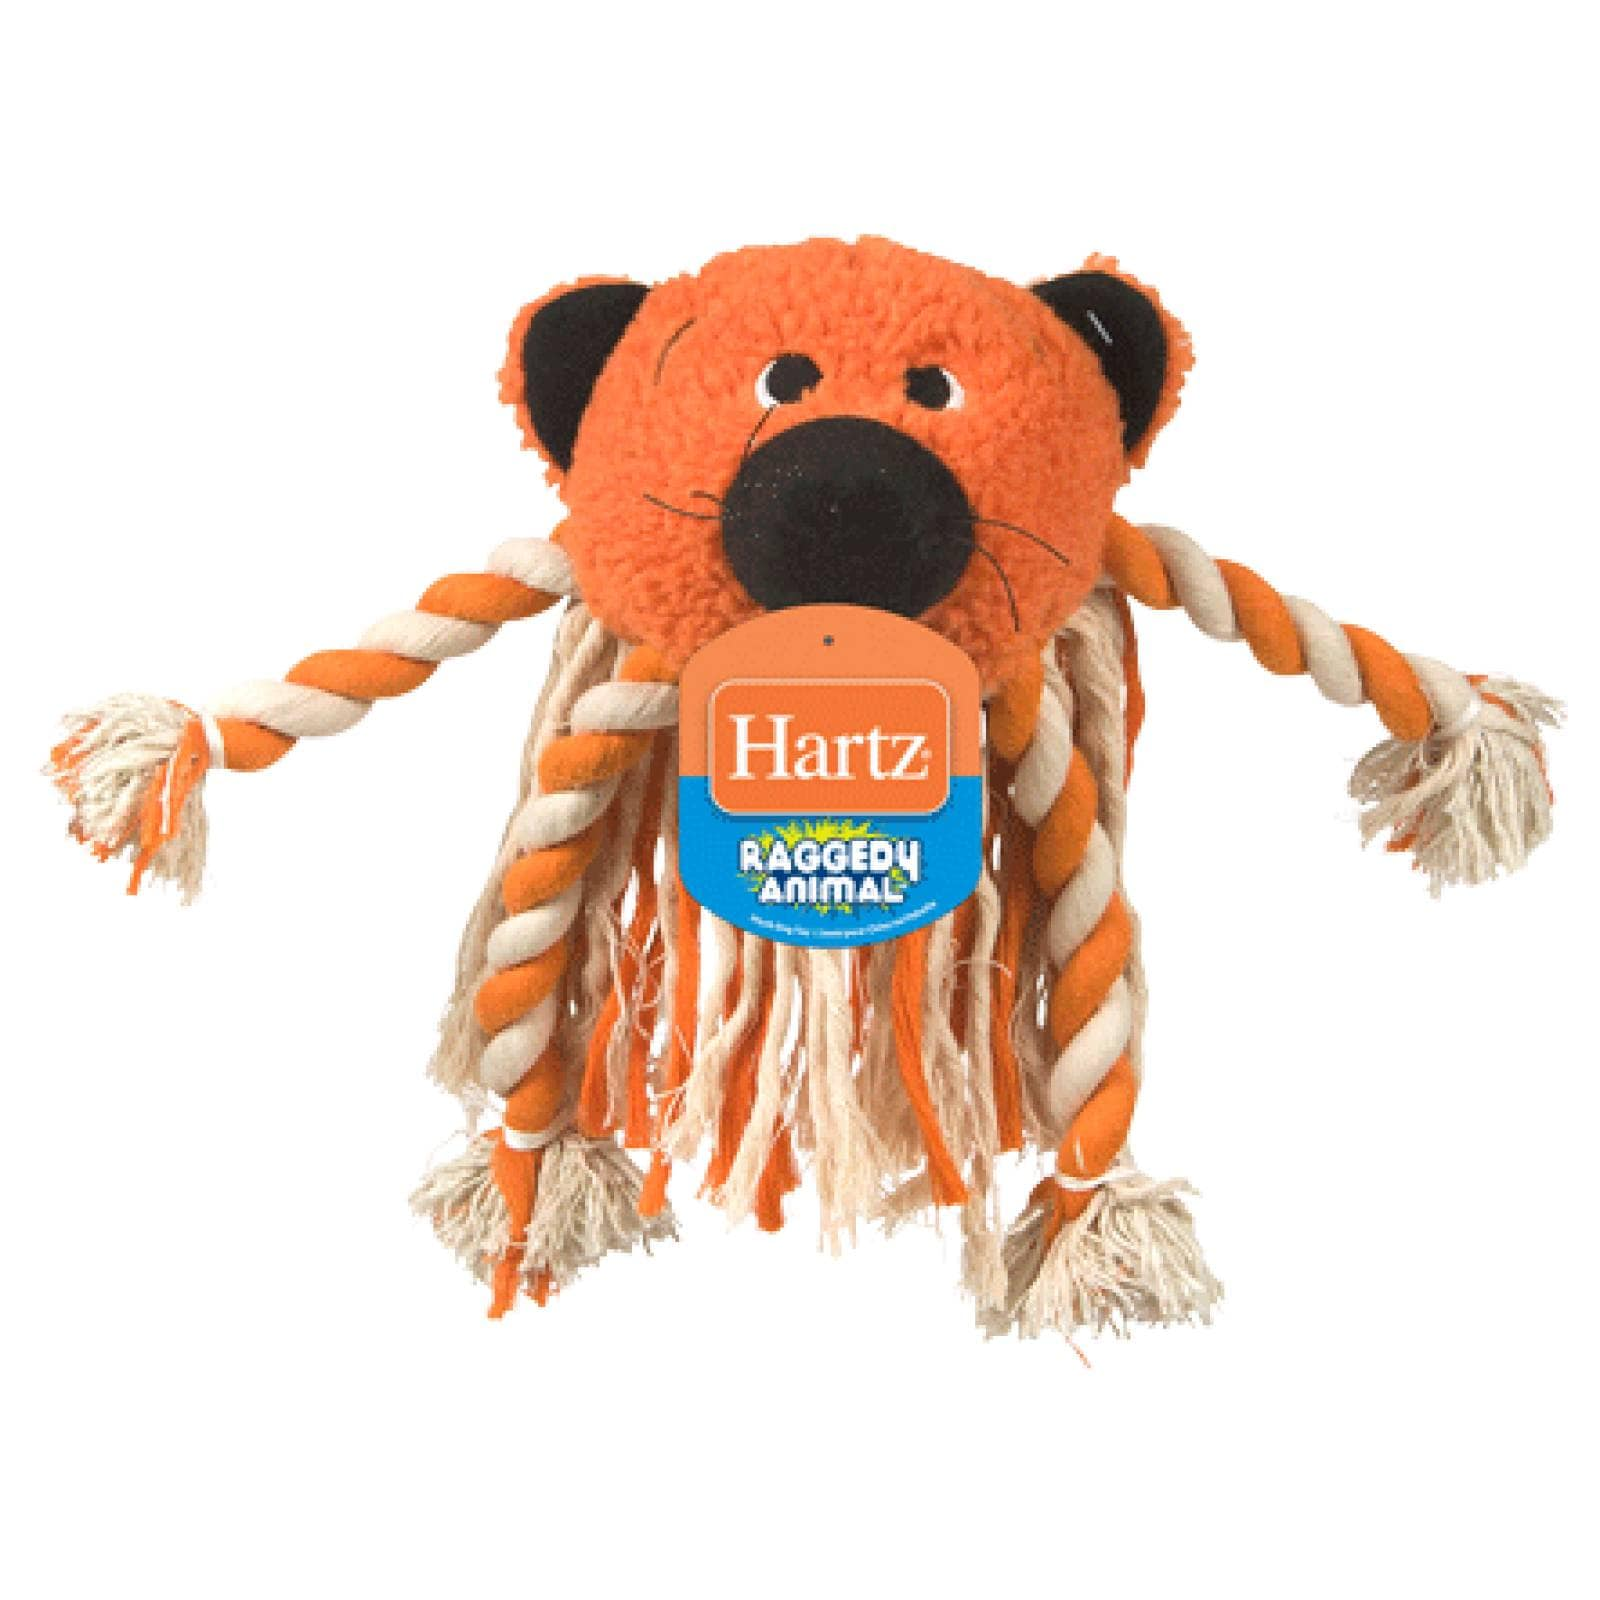 Hartz Juguete para Perro Raggedy Extremidades de Hilo